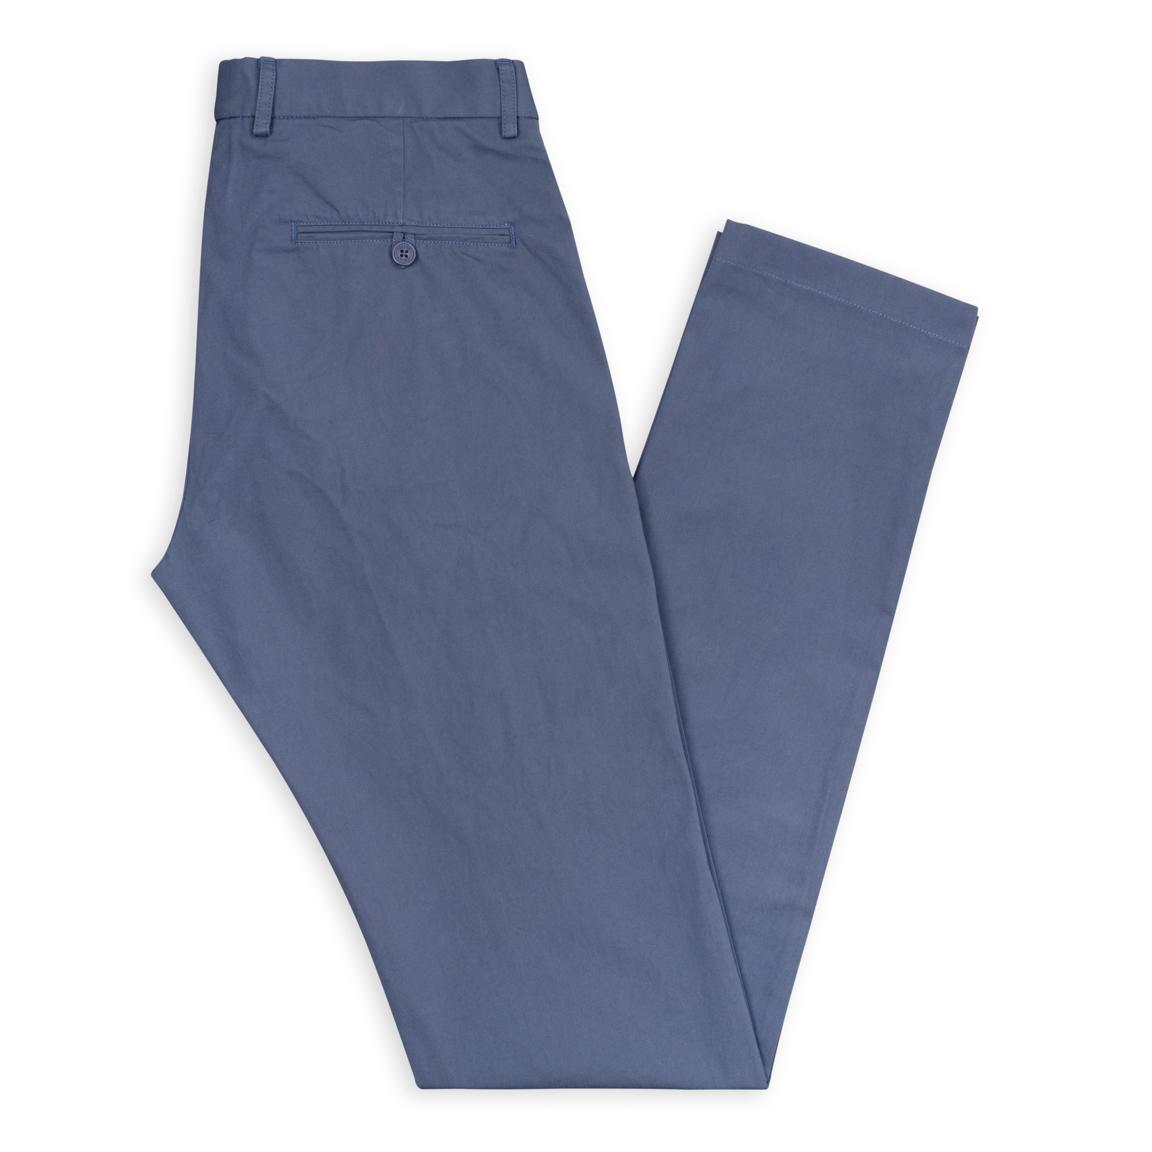 Indigo blue tailor made chinos